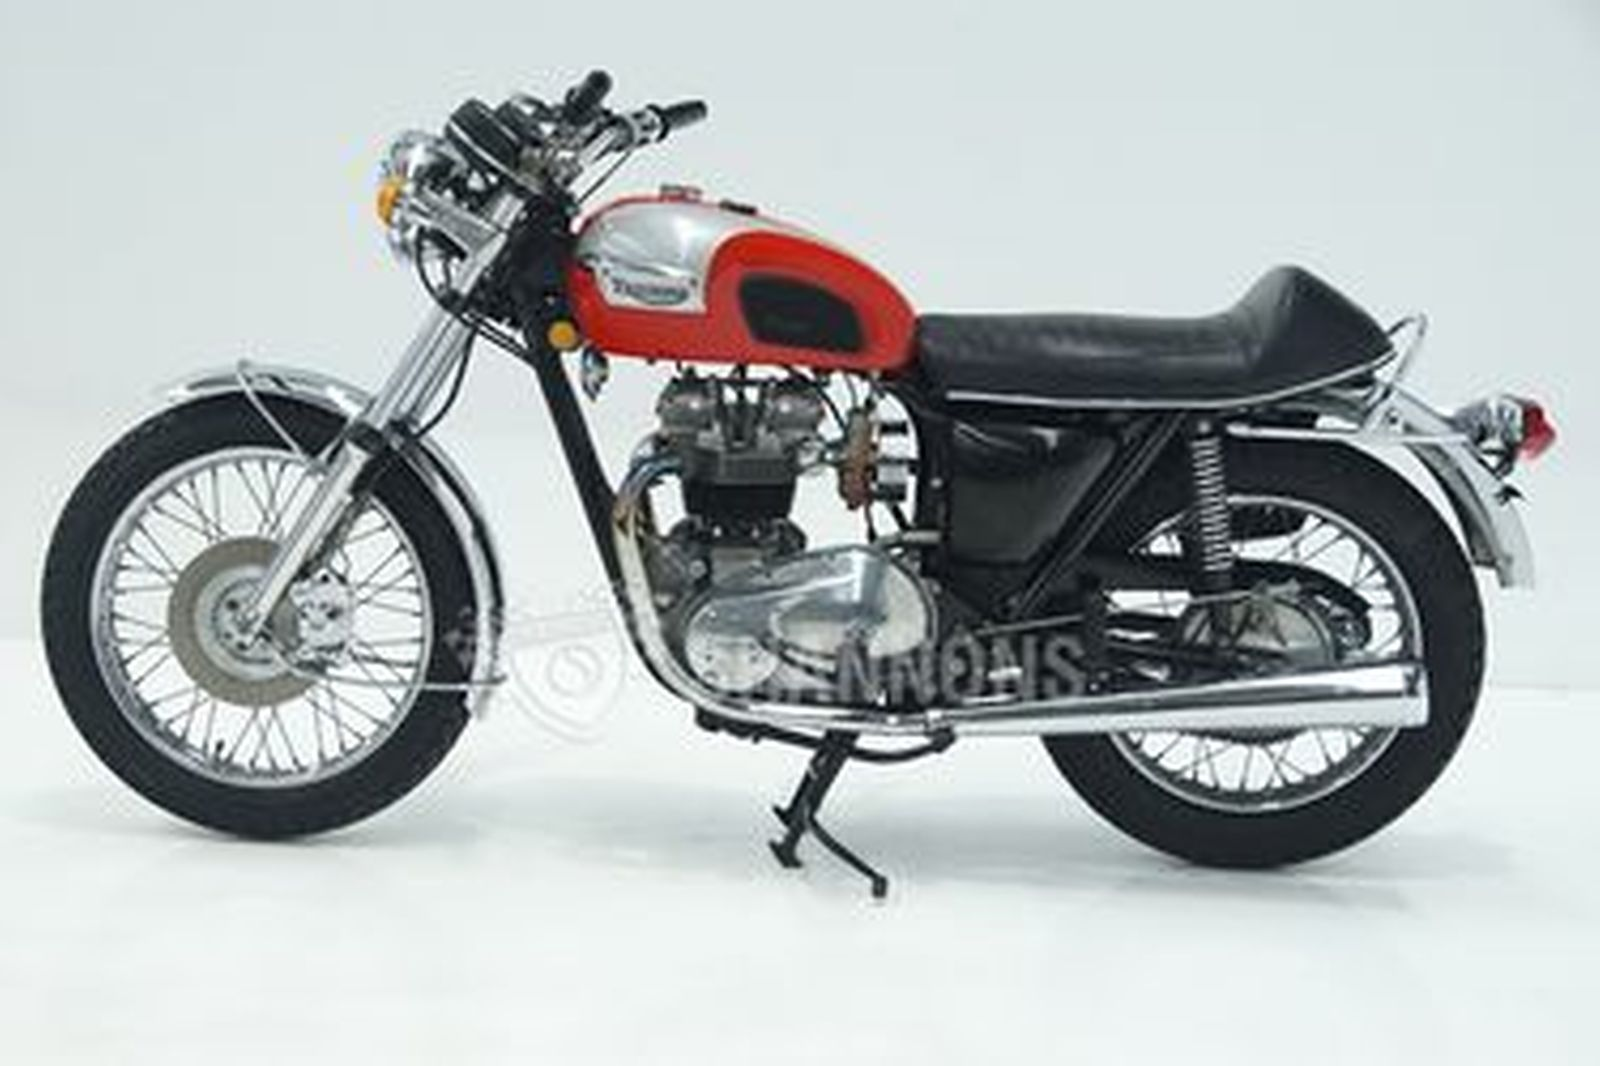 Triumph TR7 750cc Motorcycle